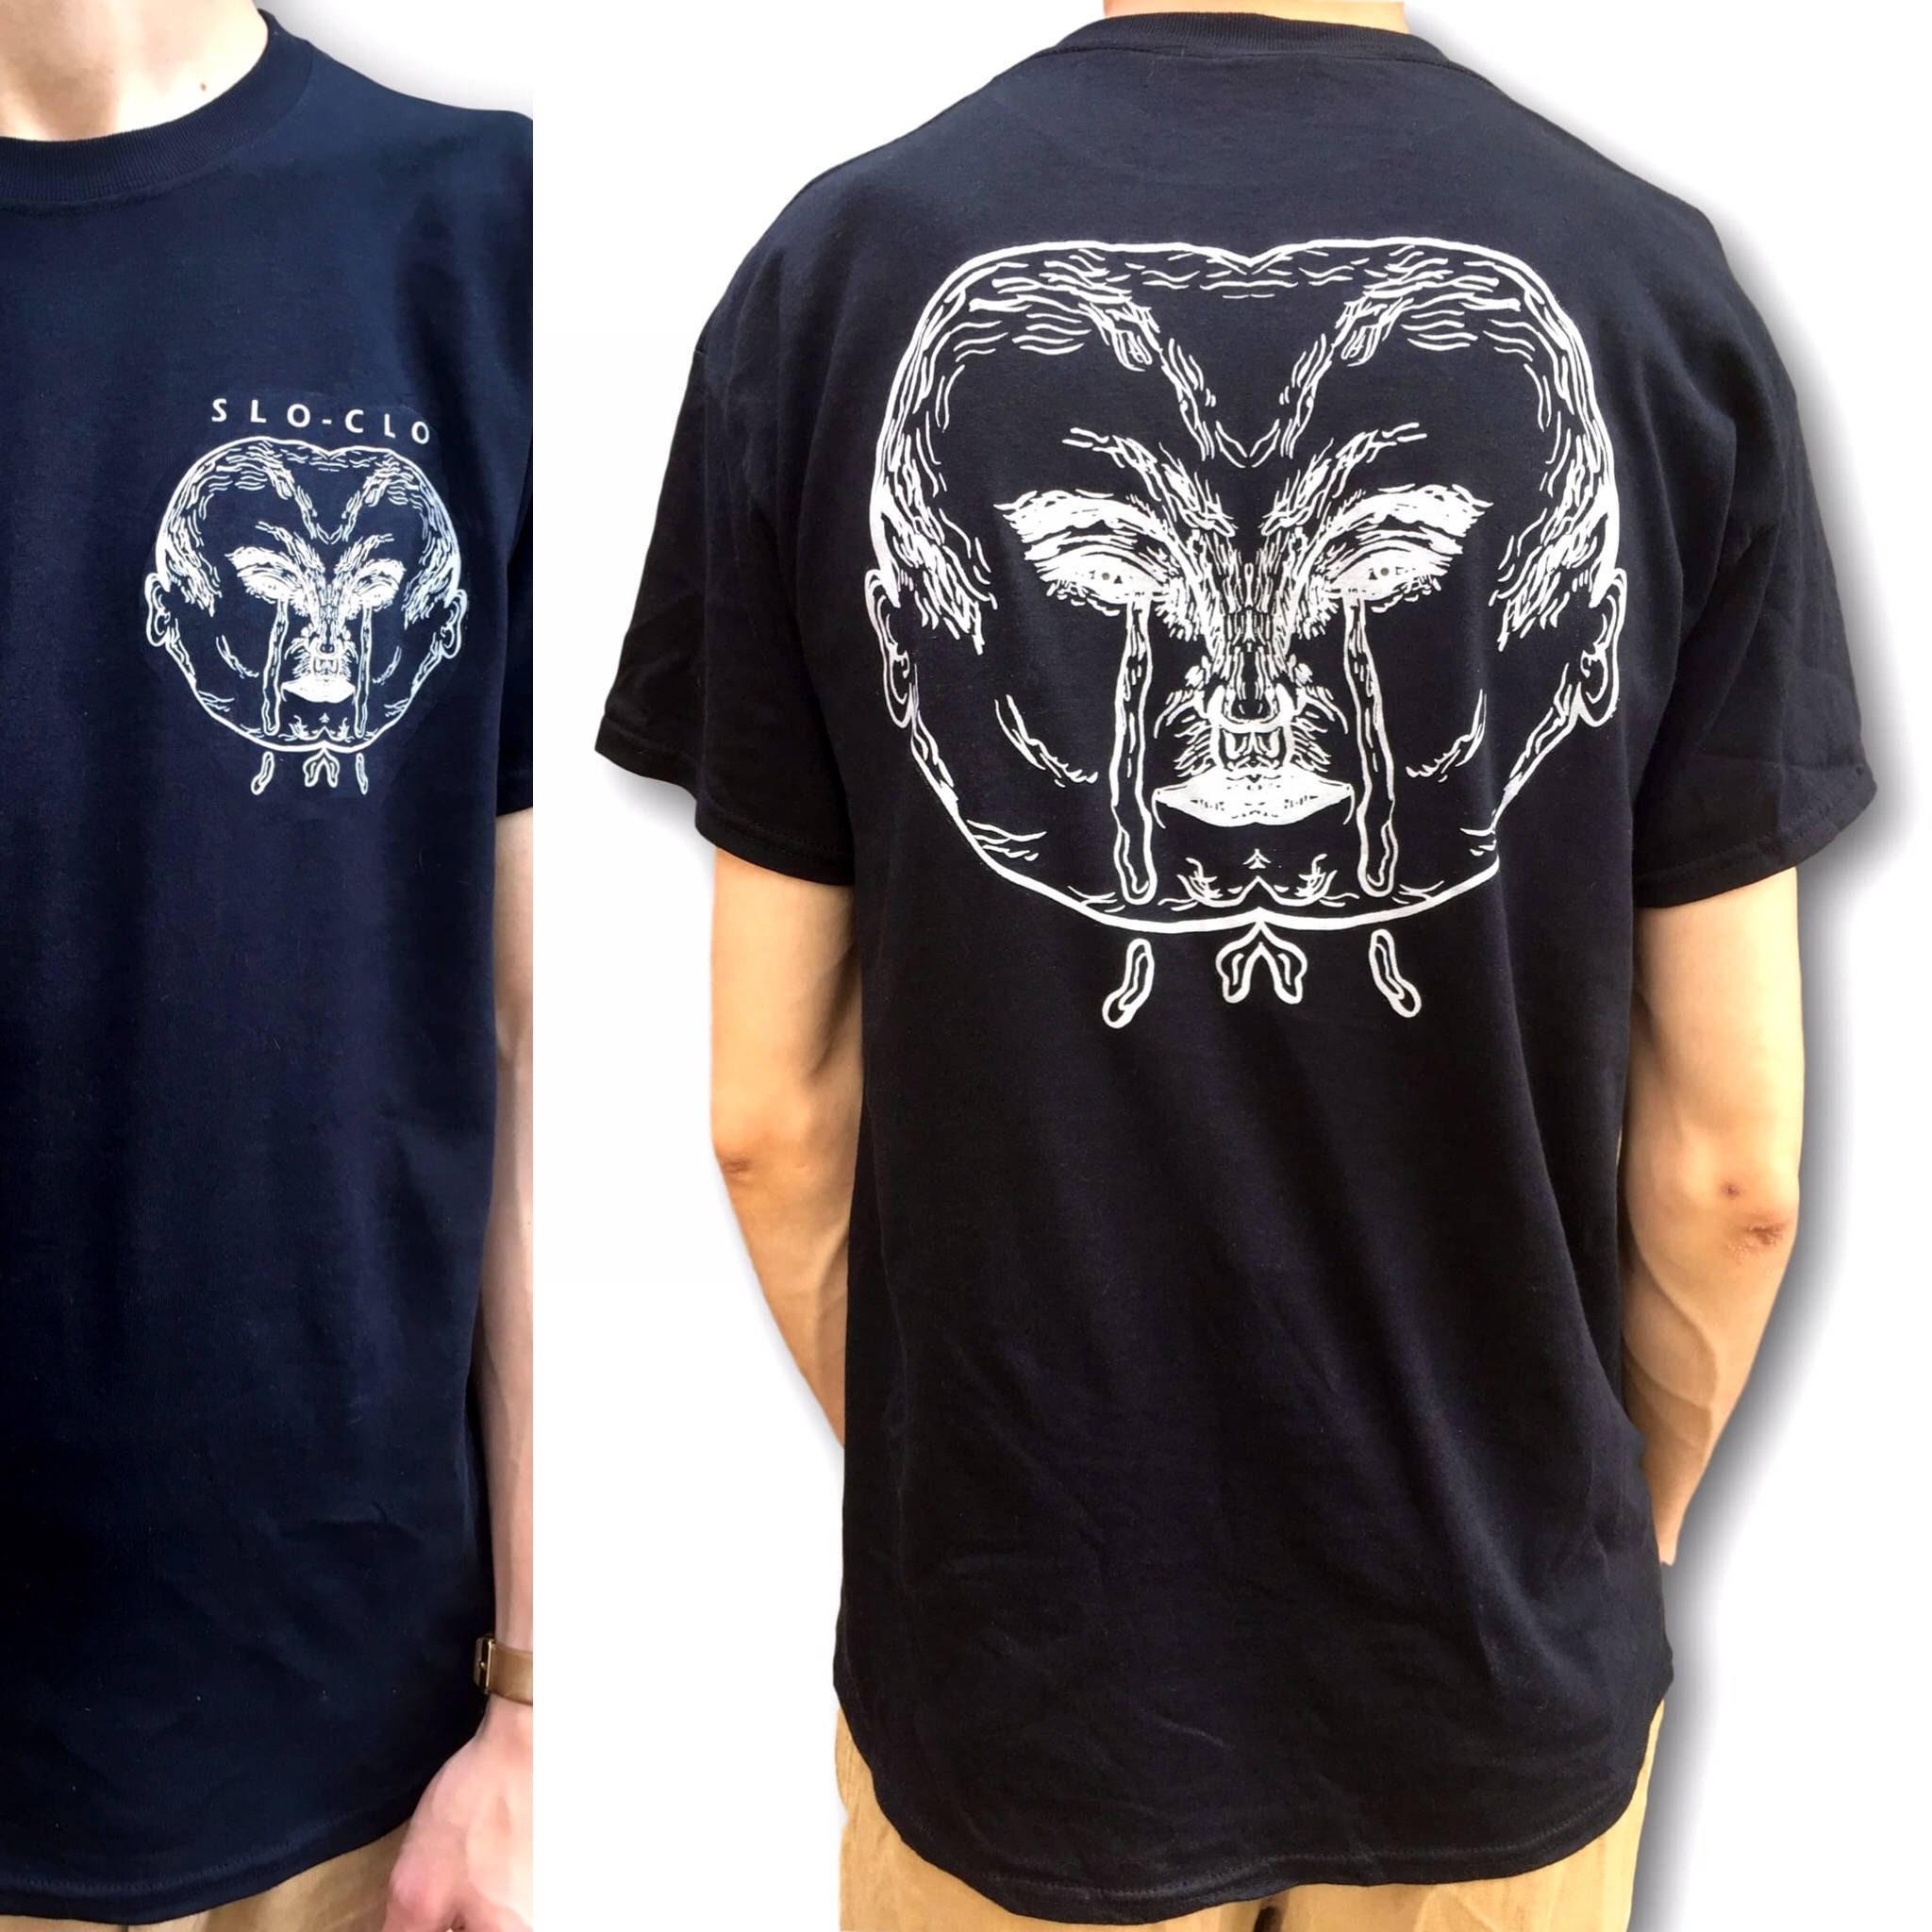 7526ce359f74f 90s Grunge T Shirt